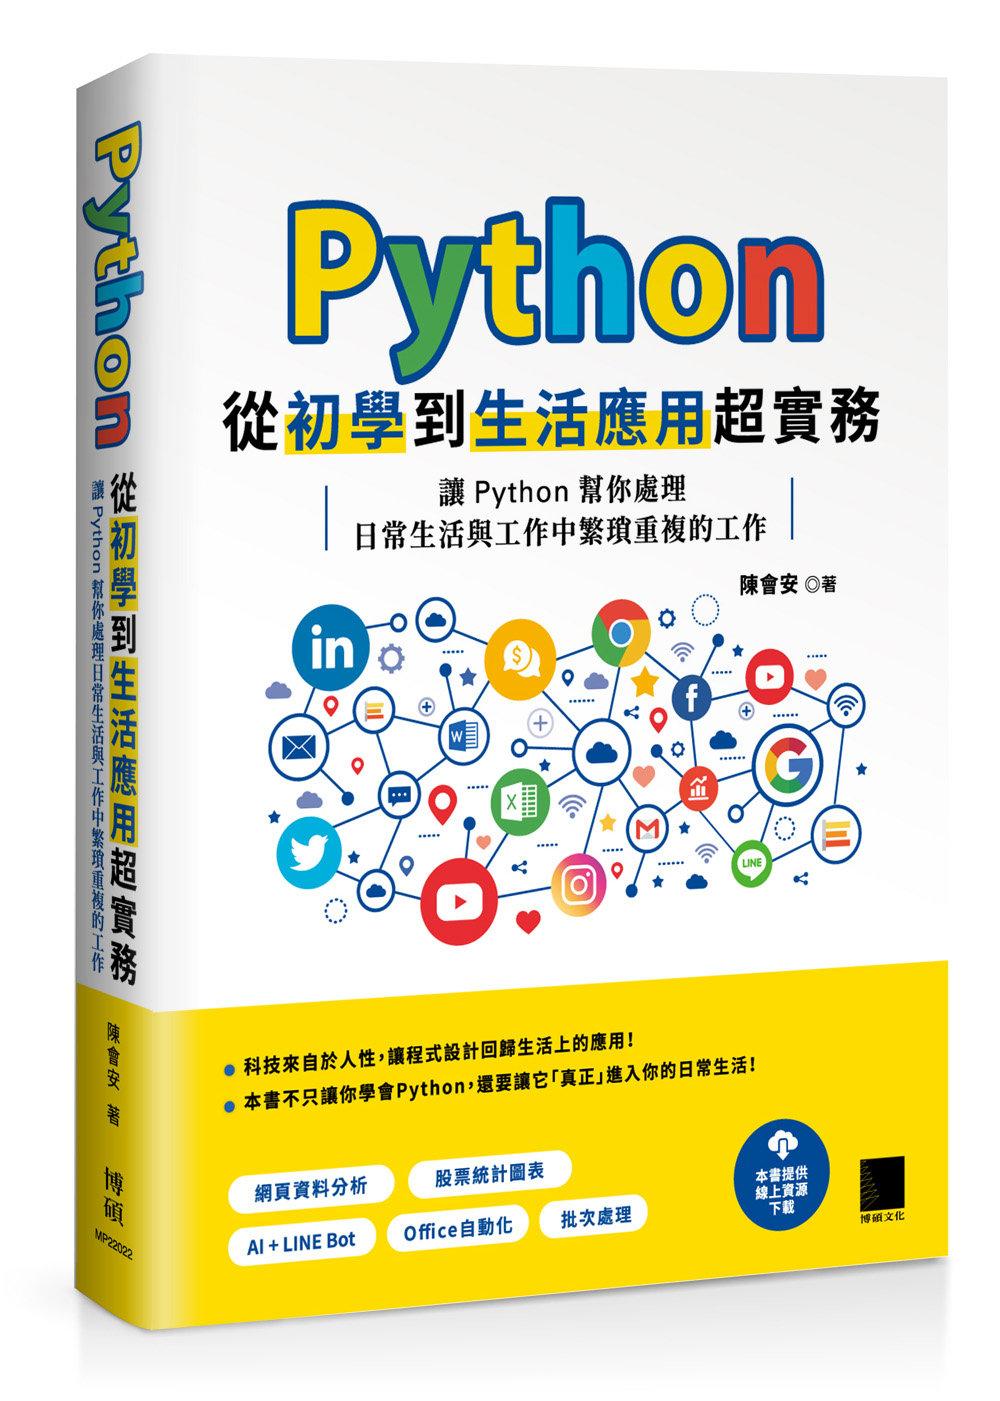 Python 從初學到生活應用超實務:讓 Python 幫你處理日常生活與工作中繁瑣重複的工作-preview-1